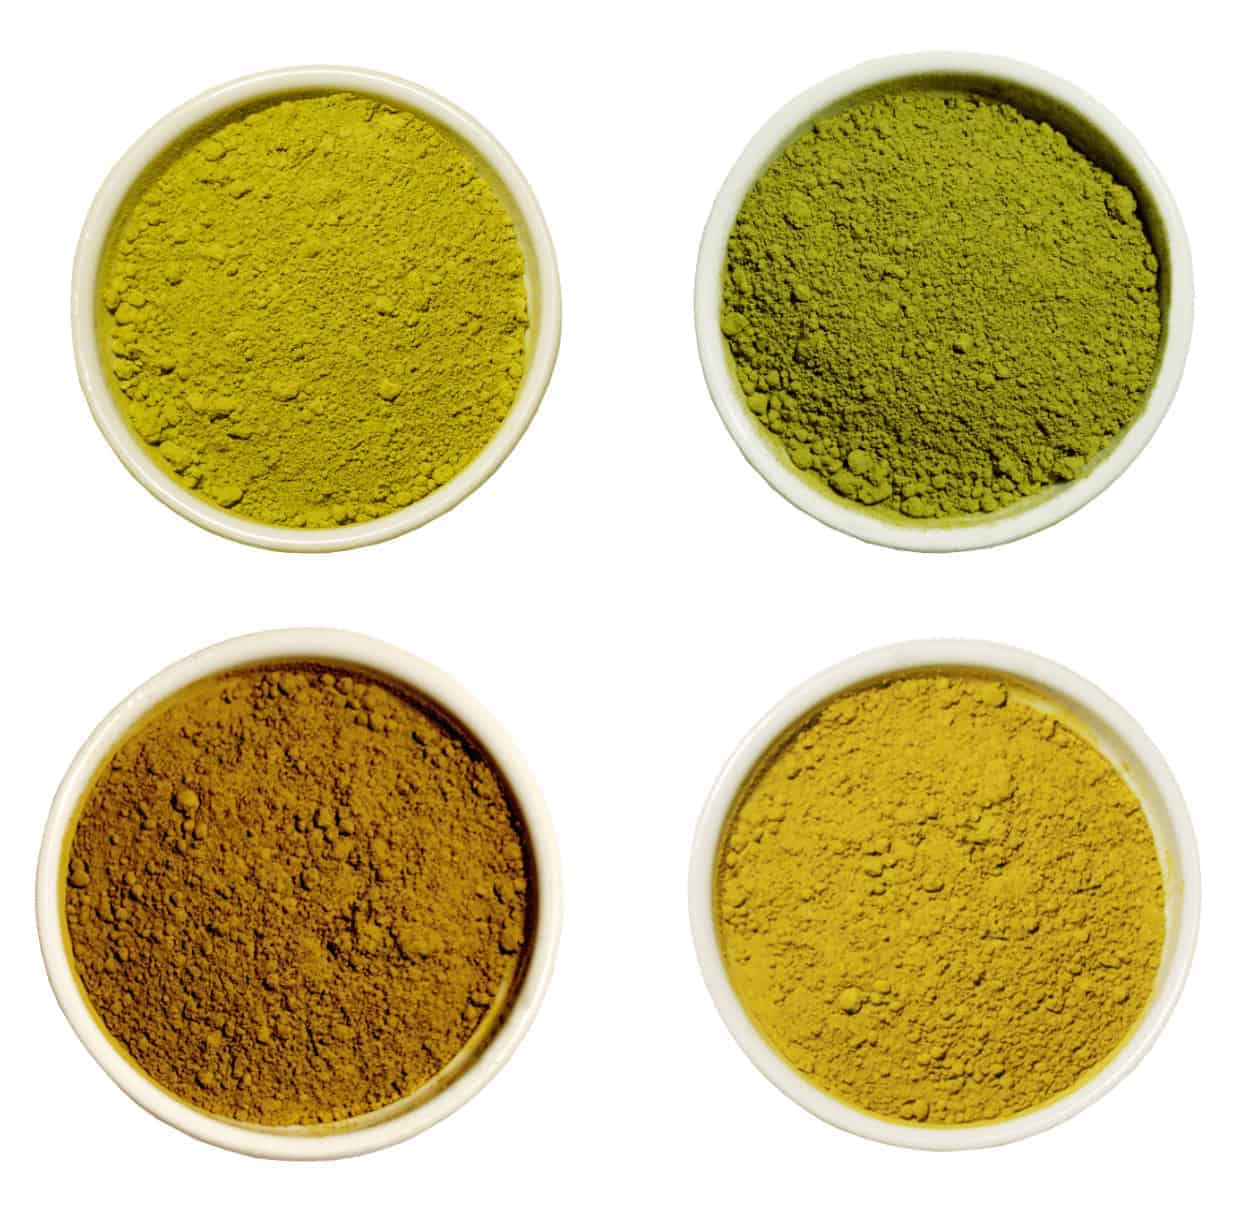 Paquete de muestra de kratom